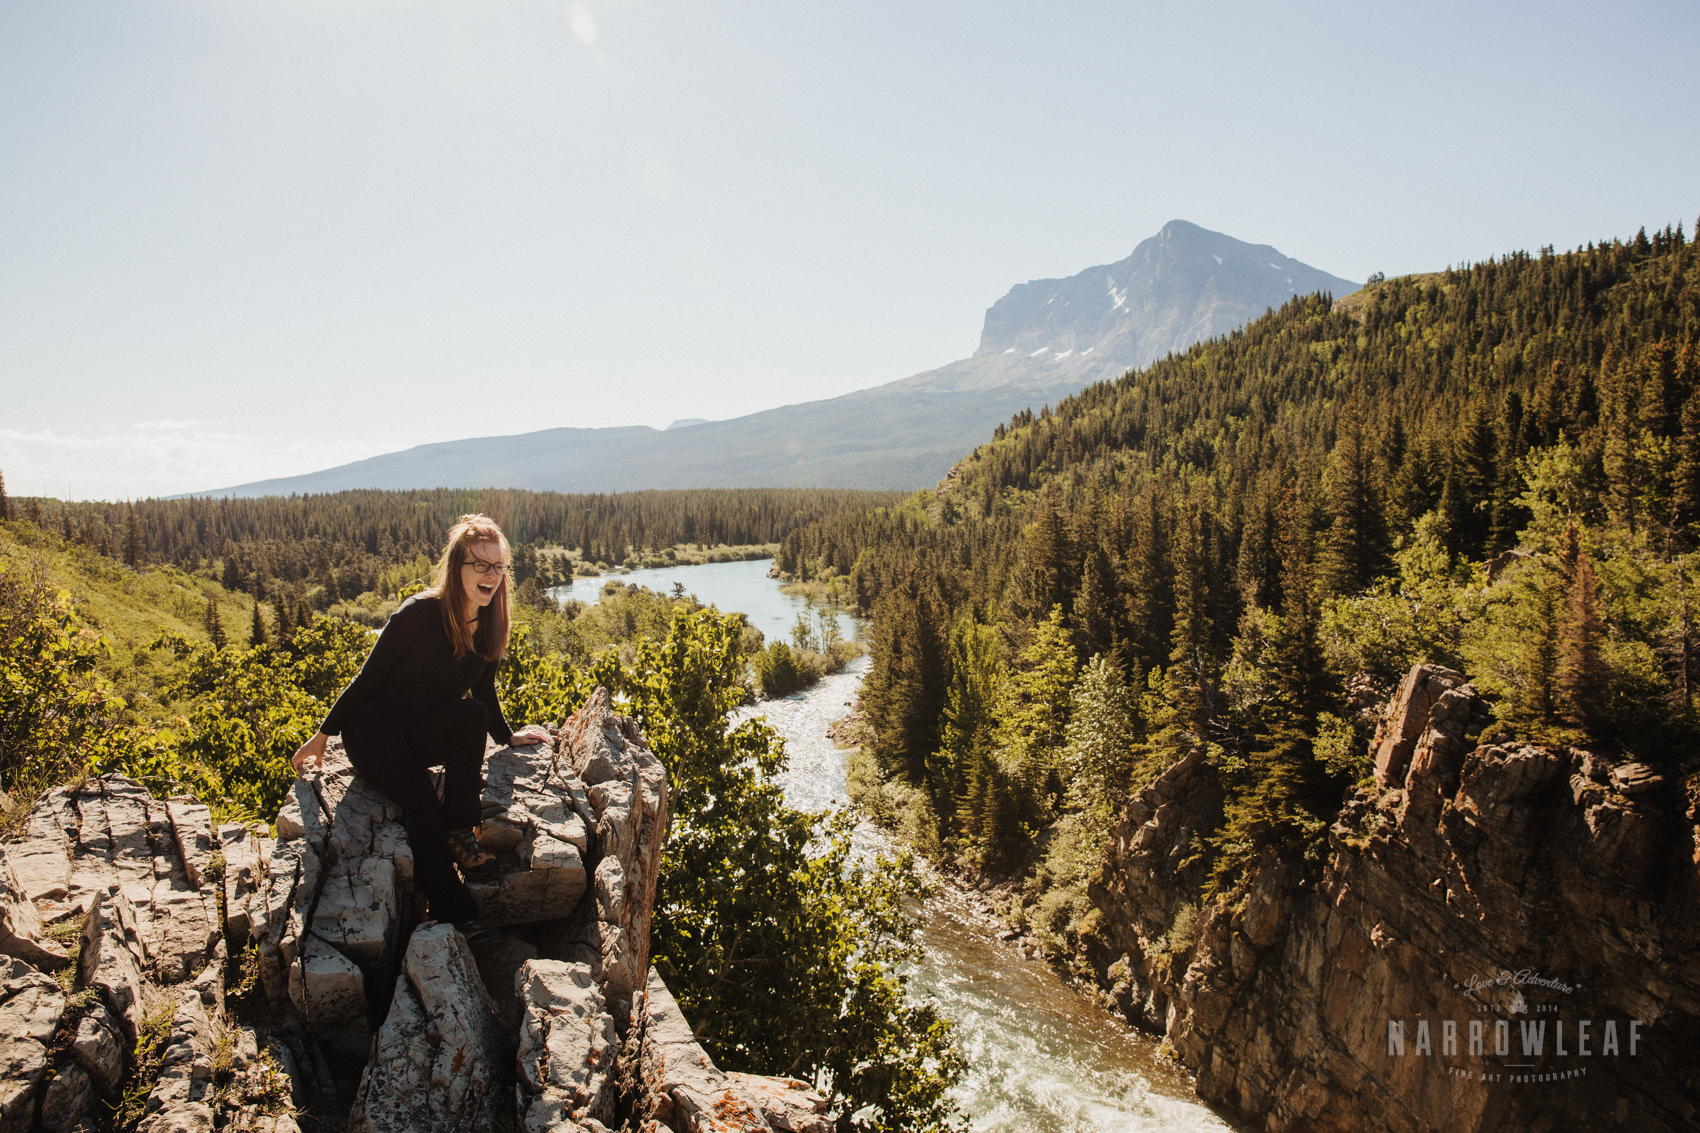 Montana-Glacier-National-Park-Many-Glacier-Narrowleaf-Love-and-Adventure-elopement-Photography-9283.jpg